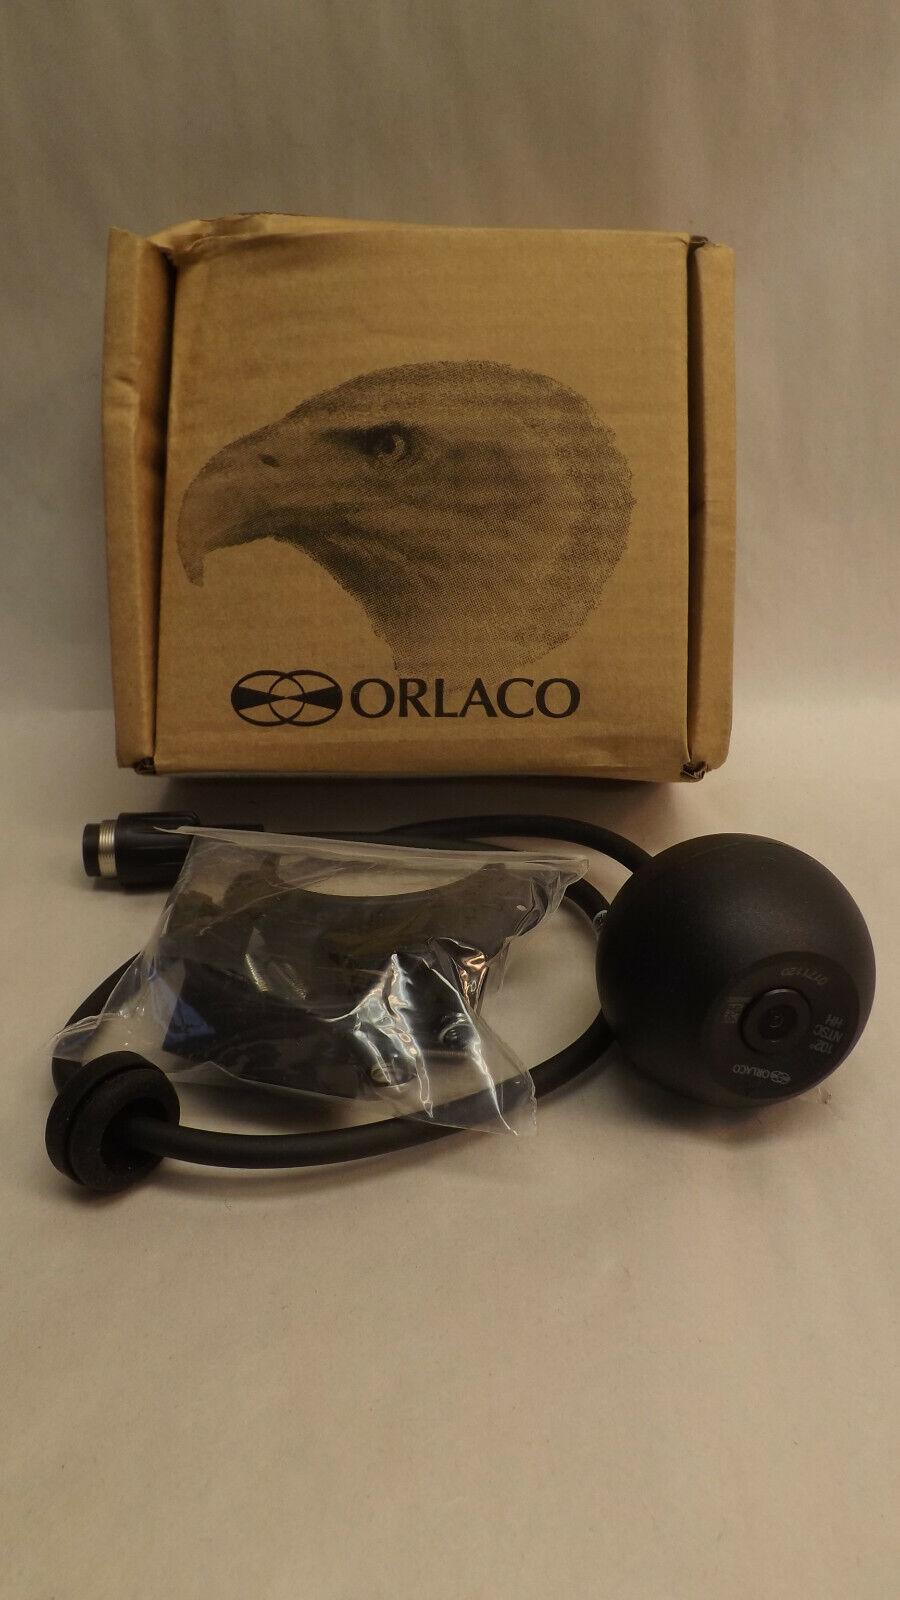 NEW Orlaco 4 Pin FAMOS camera 102º PAL MIRROR Rear View, part # 0171120